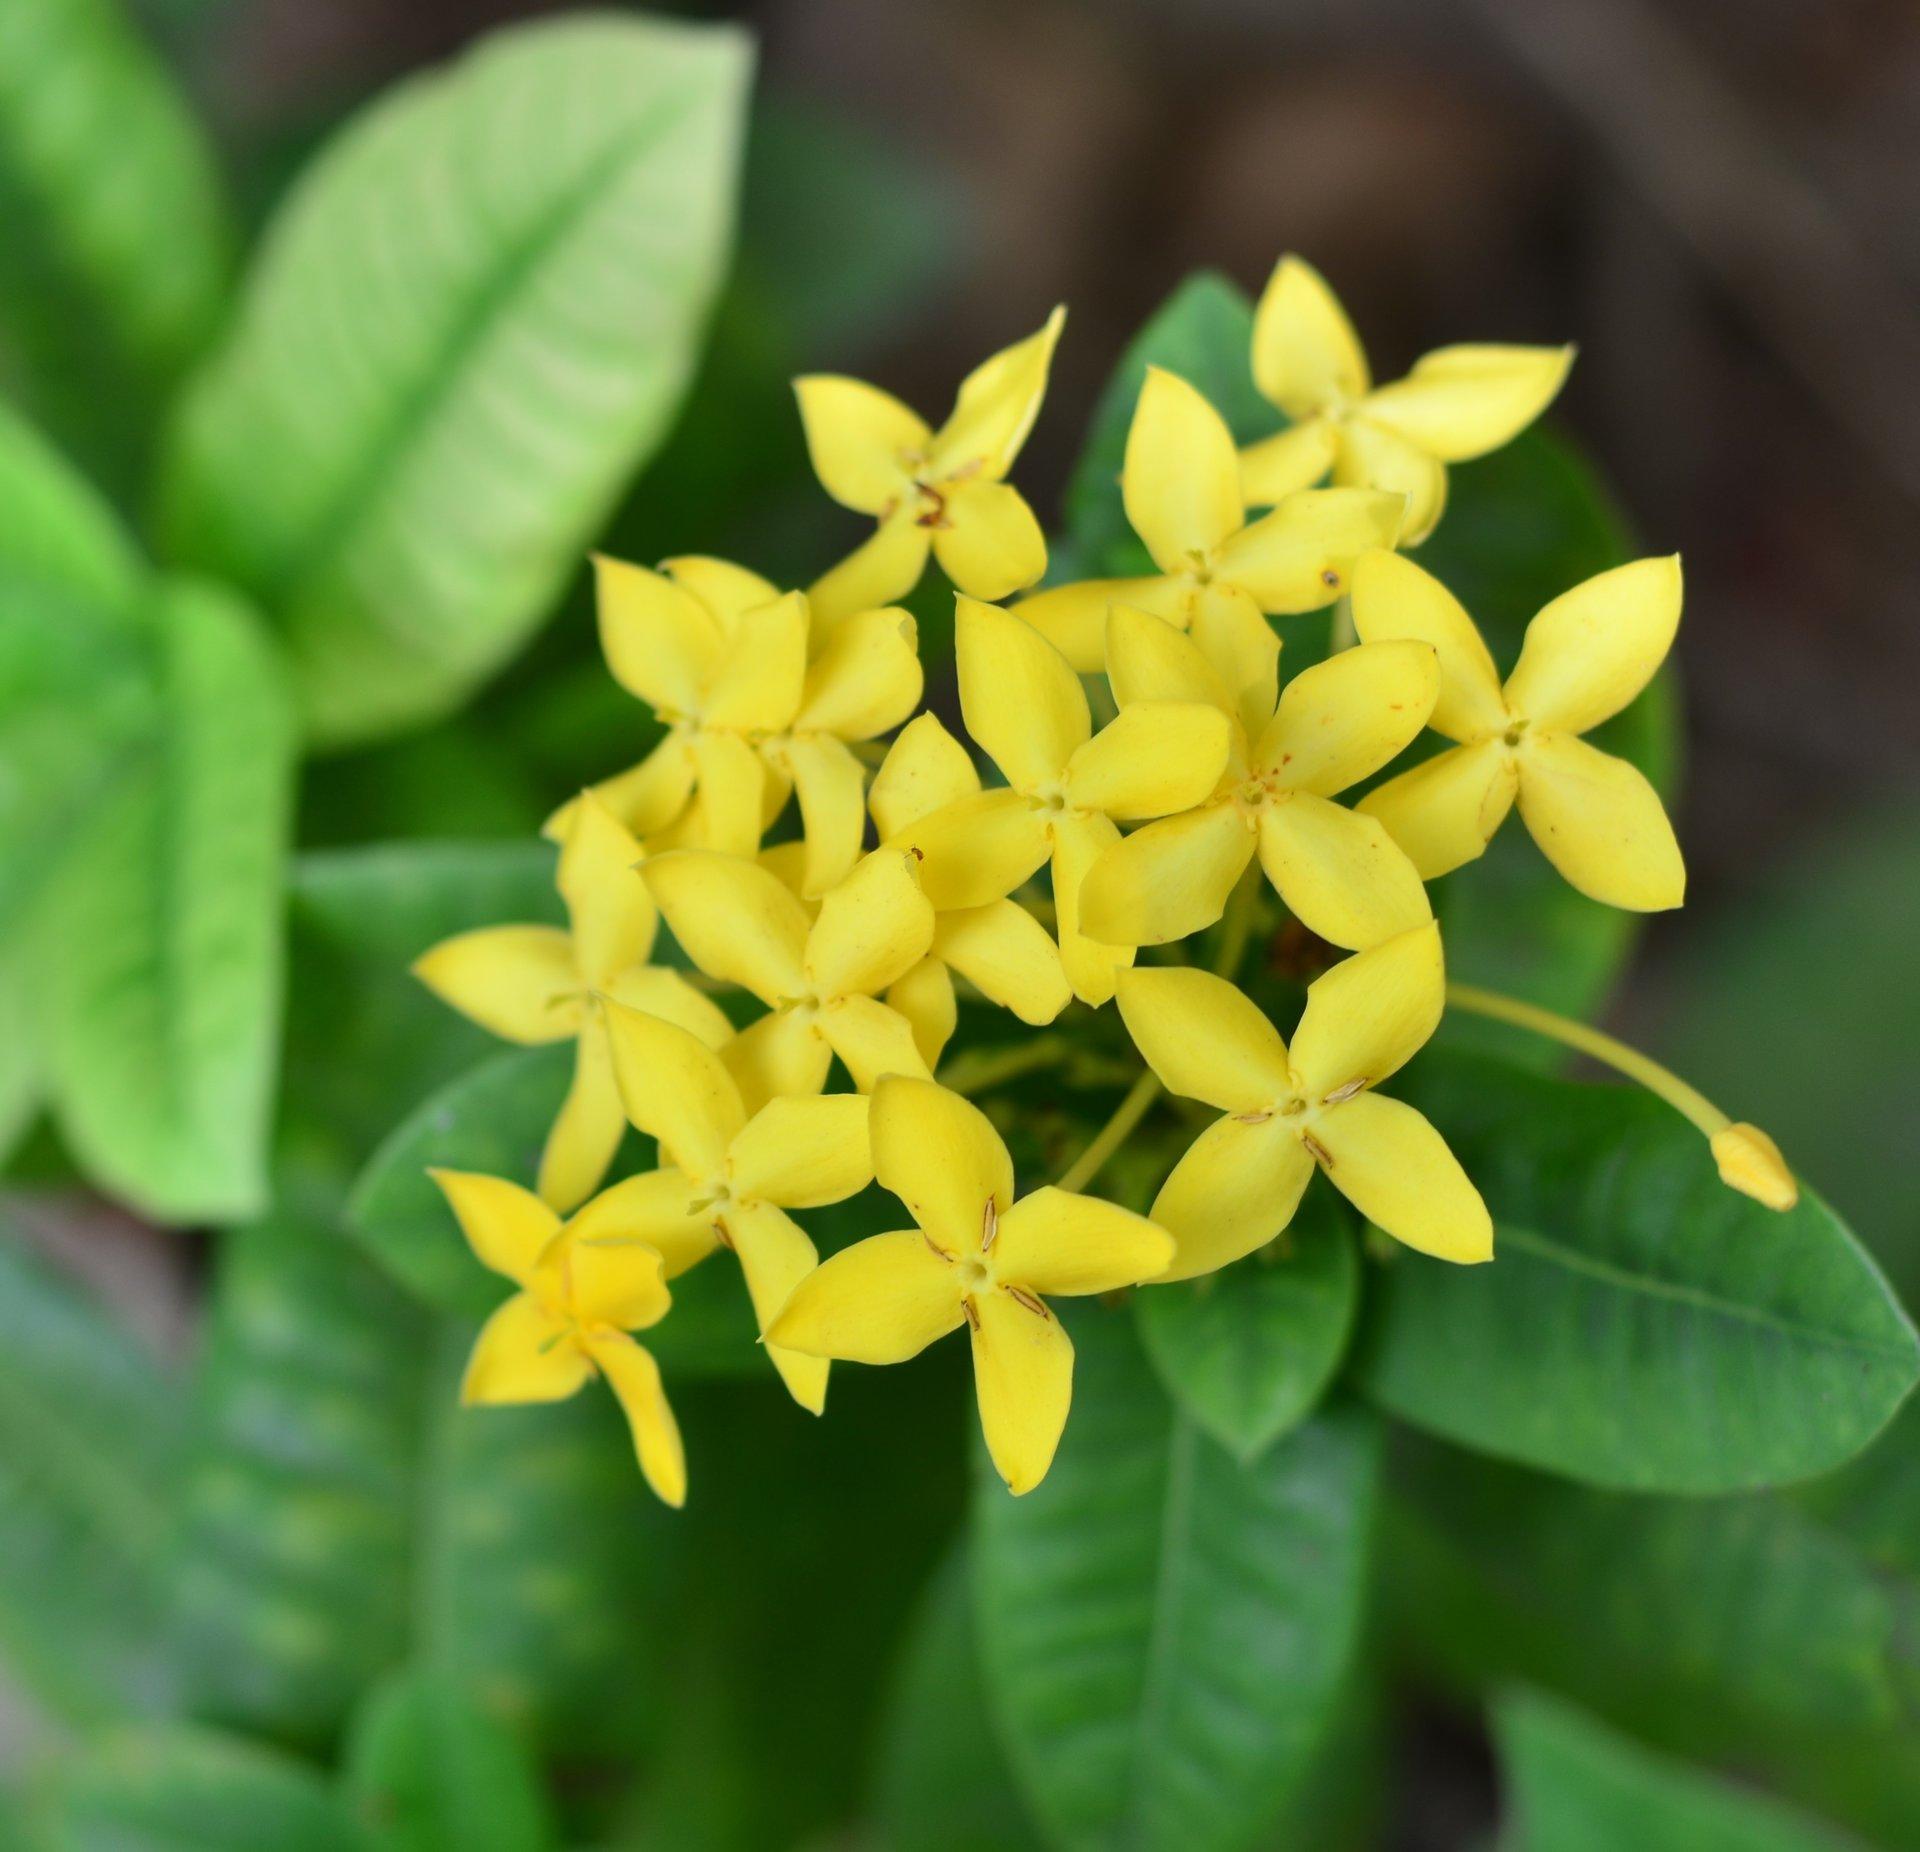 Rampicante Fiori Gialli.Rhyncospermum Asiaticum Fiore Giallo V19 Gelsomino